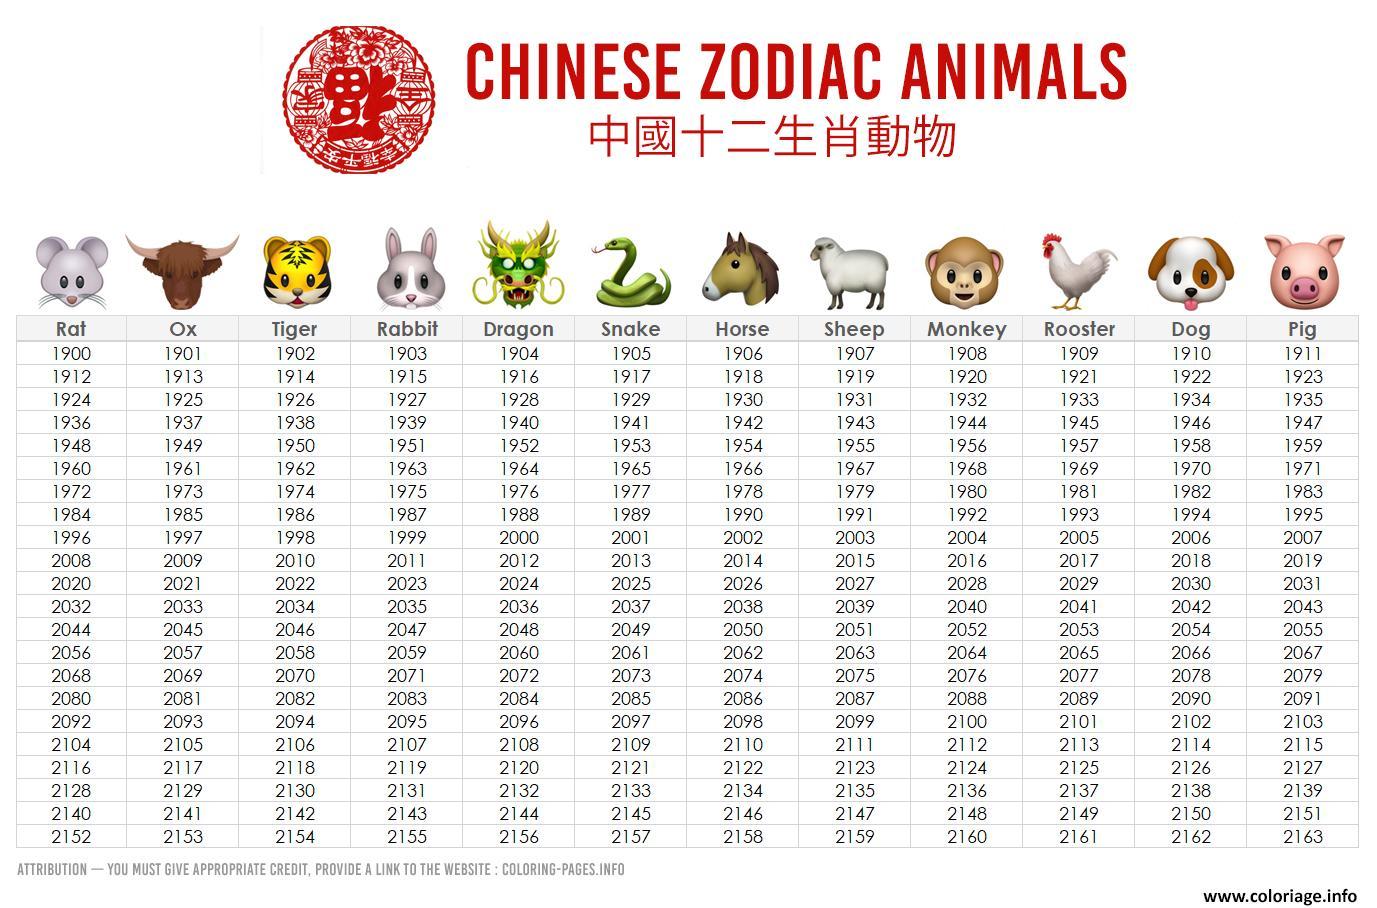 Dessin chinese zodiac animals calendar year Coloriage Gratuit à Imprimer